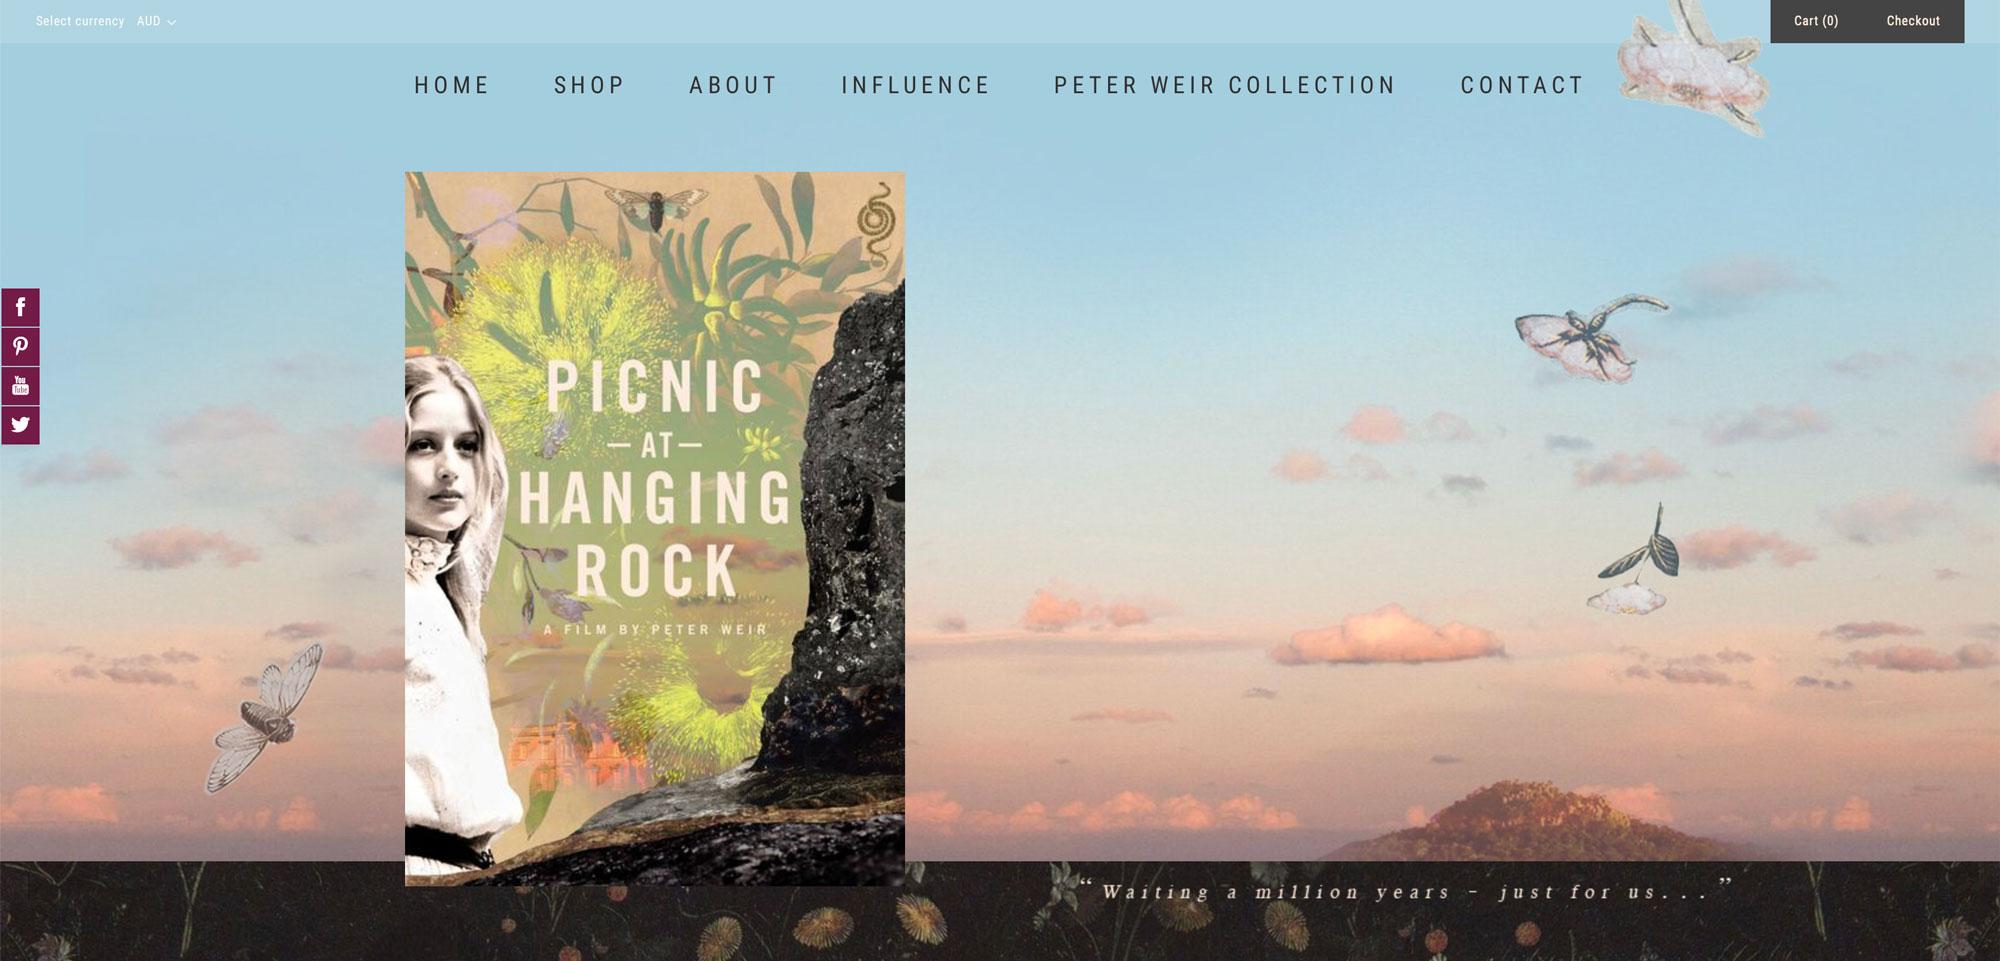 PicnicProductionsWebsite_PeterWeir.jpg